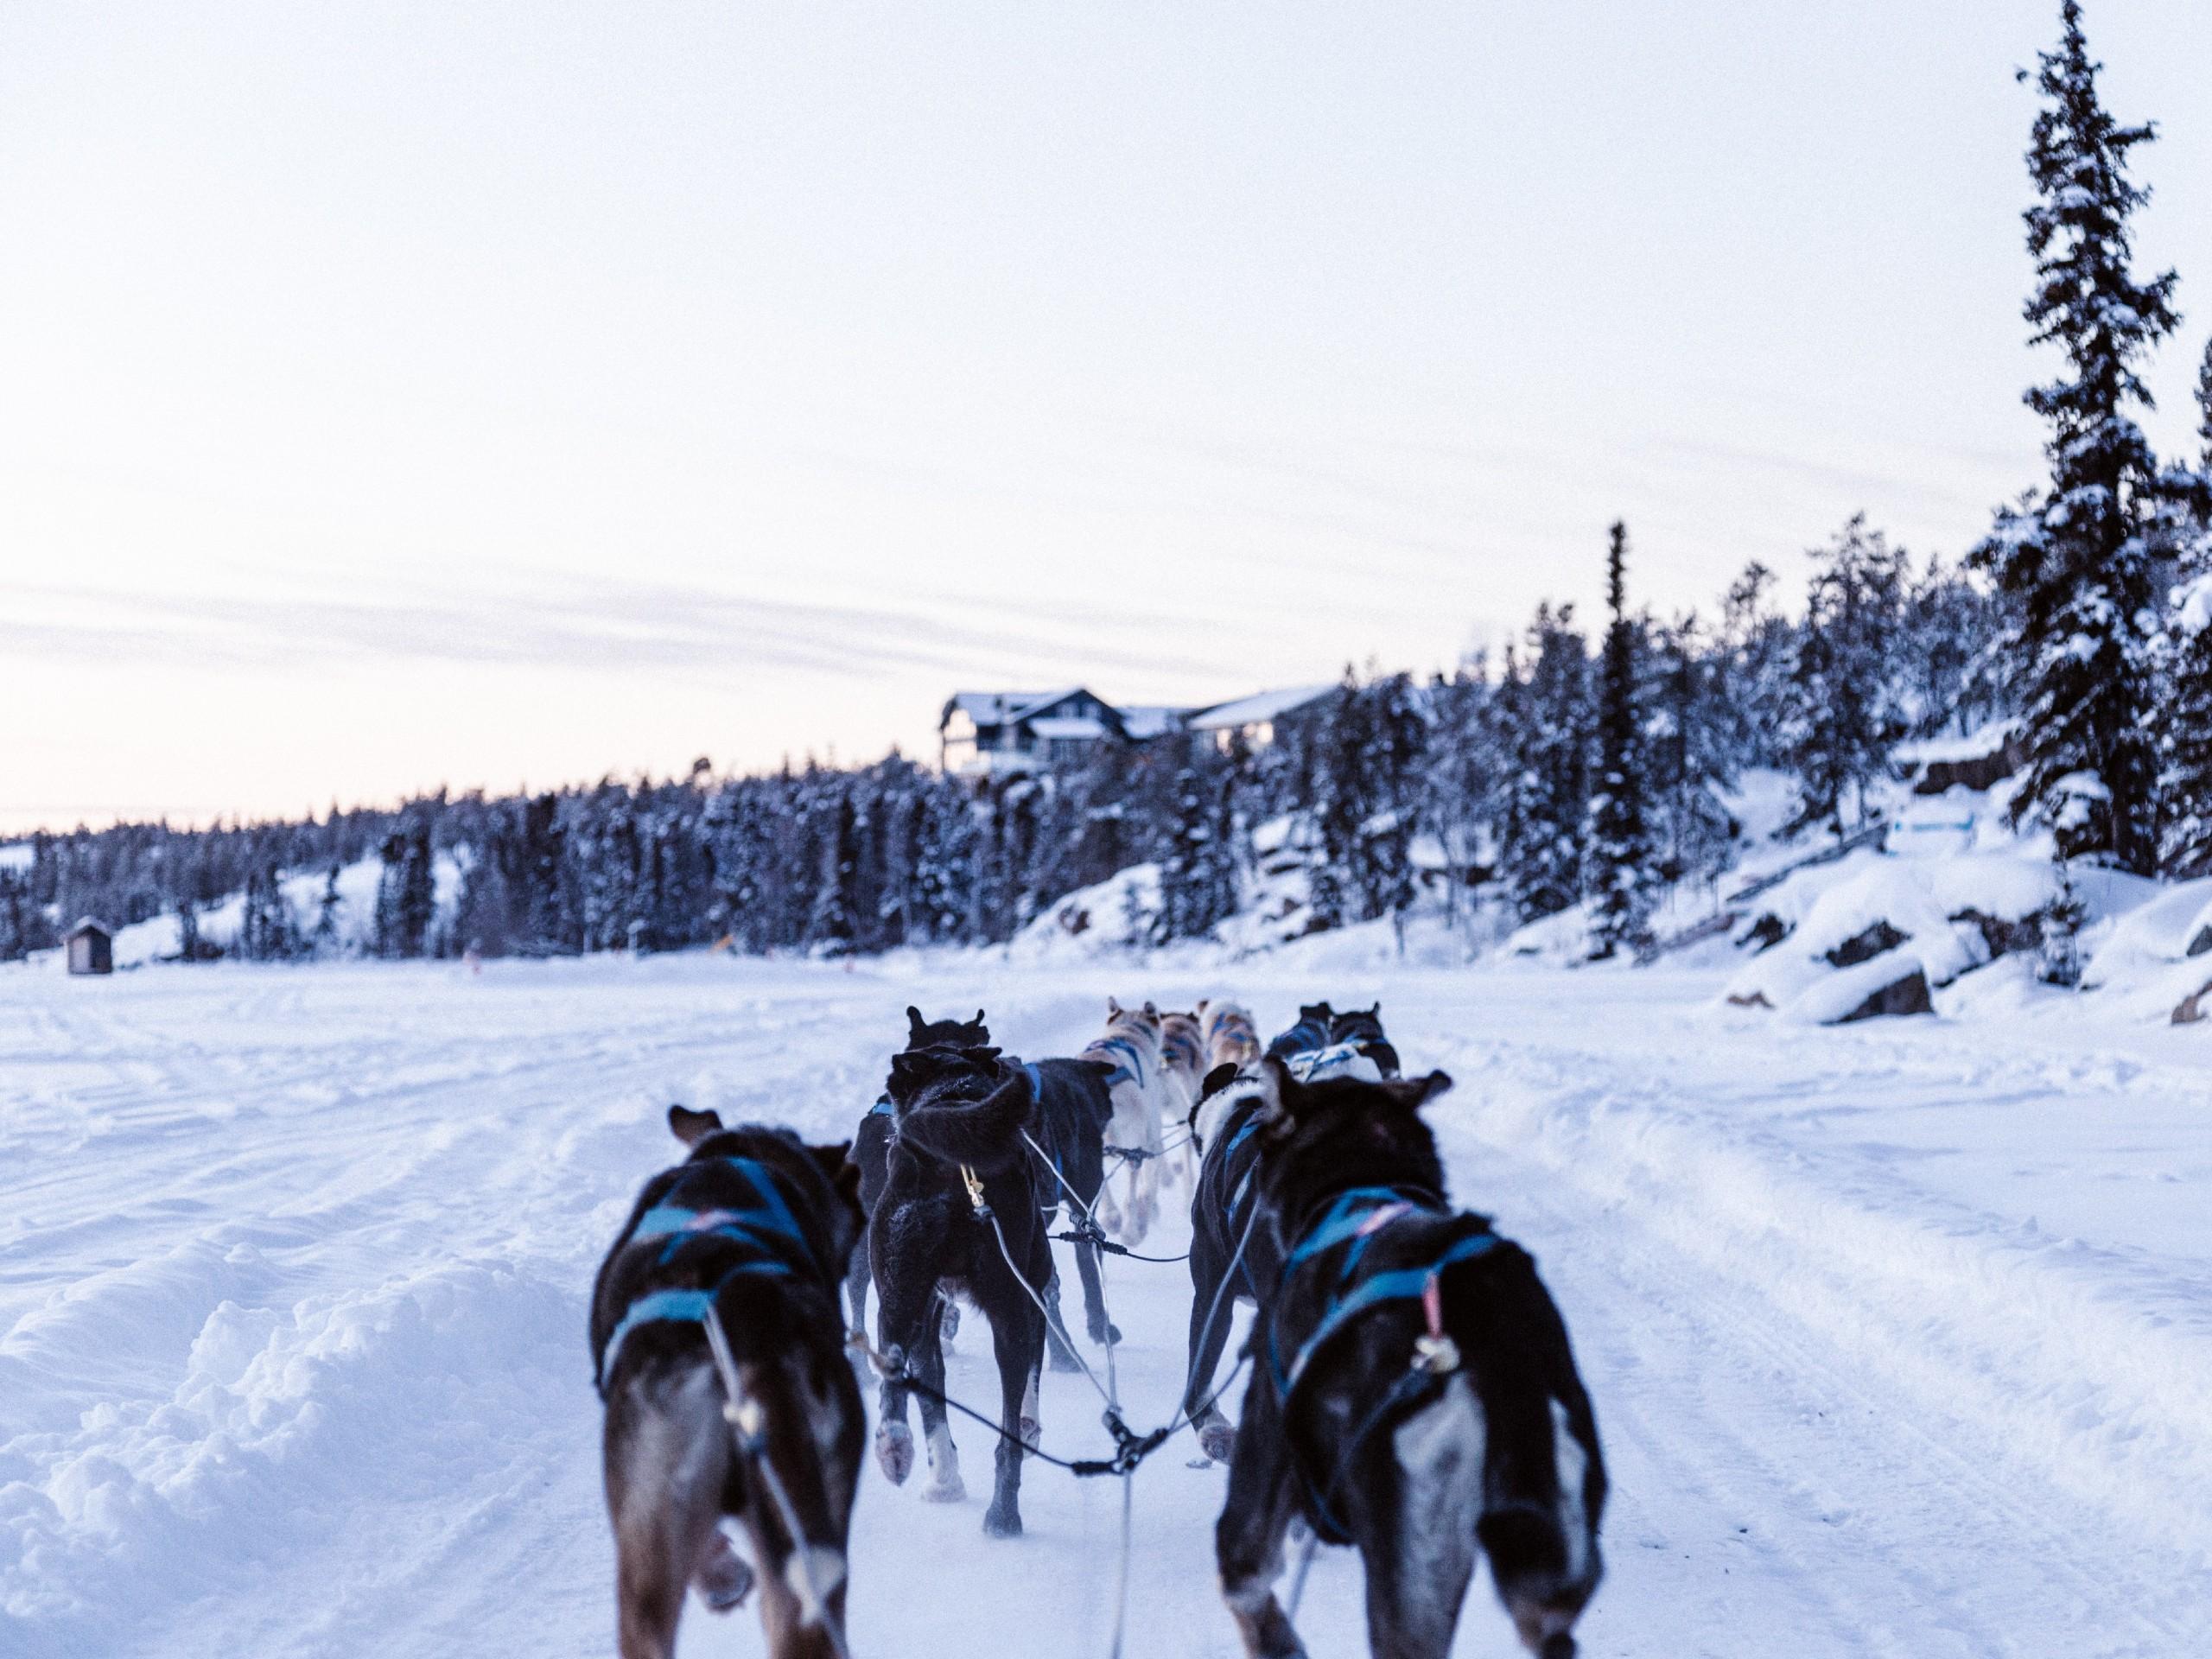 Dog sledding in Yukon is a wonderful winter activity